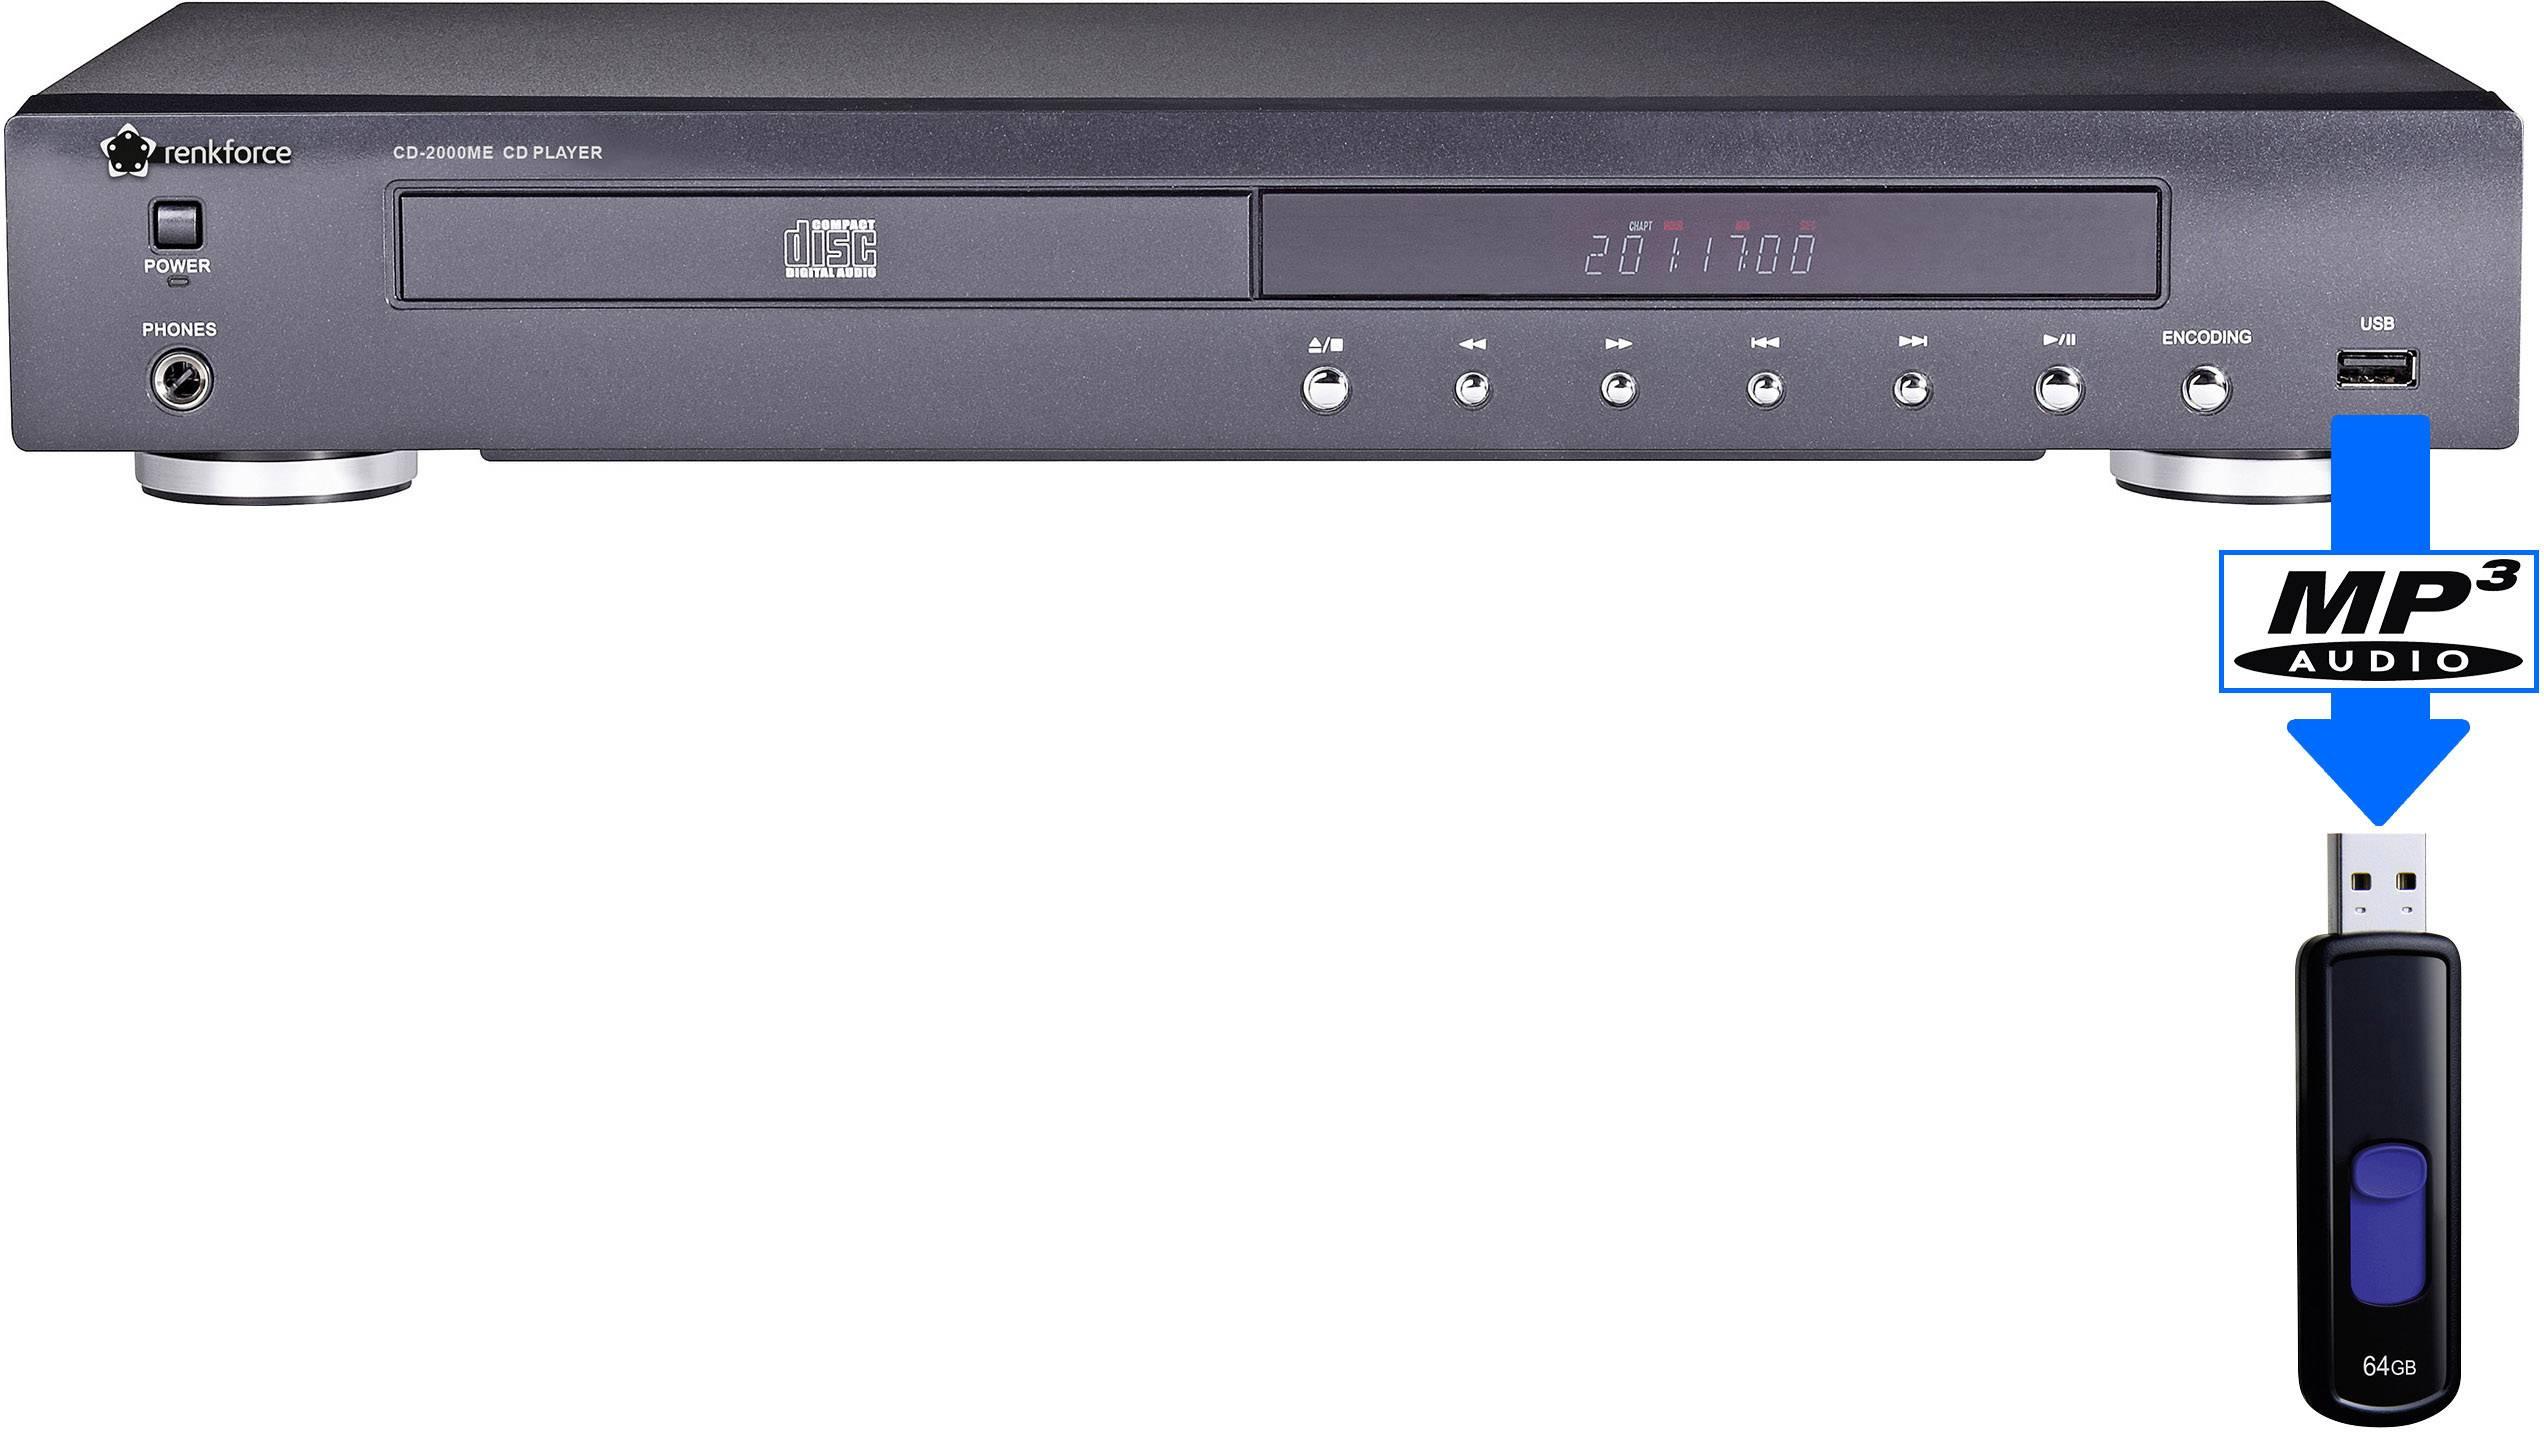 CD prehrávač Renkforce CD-2000ME, čierna